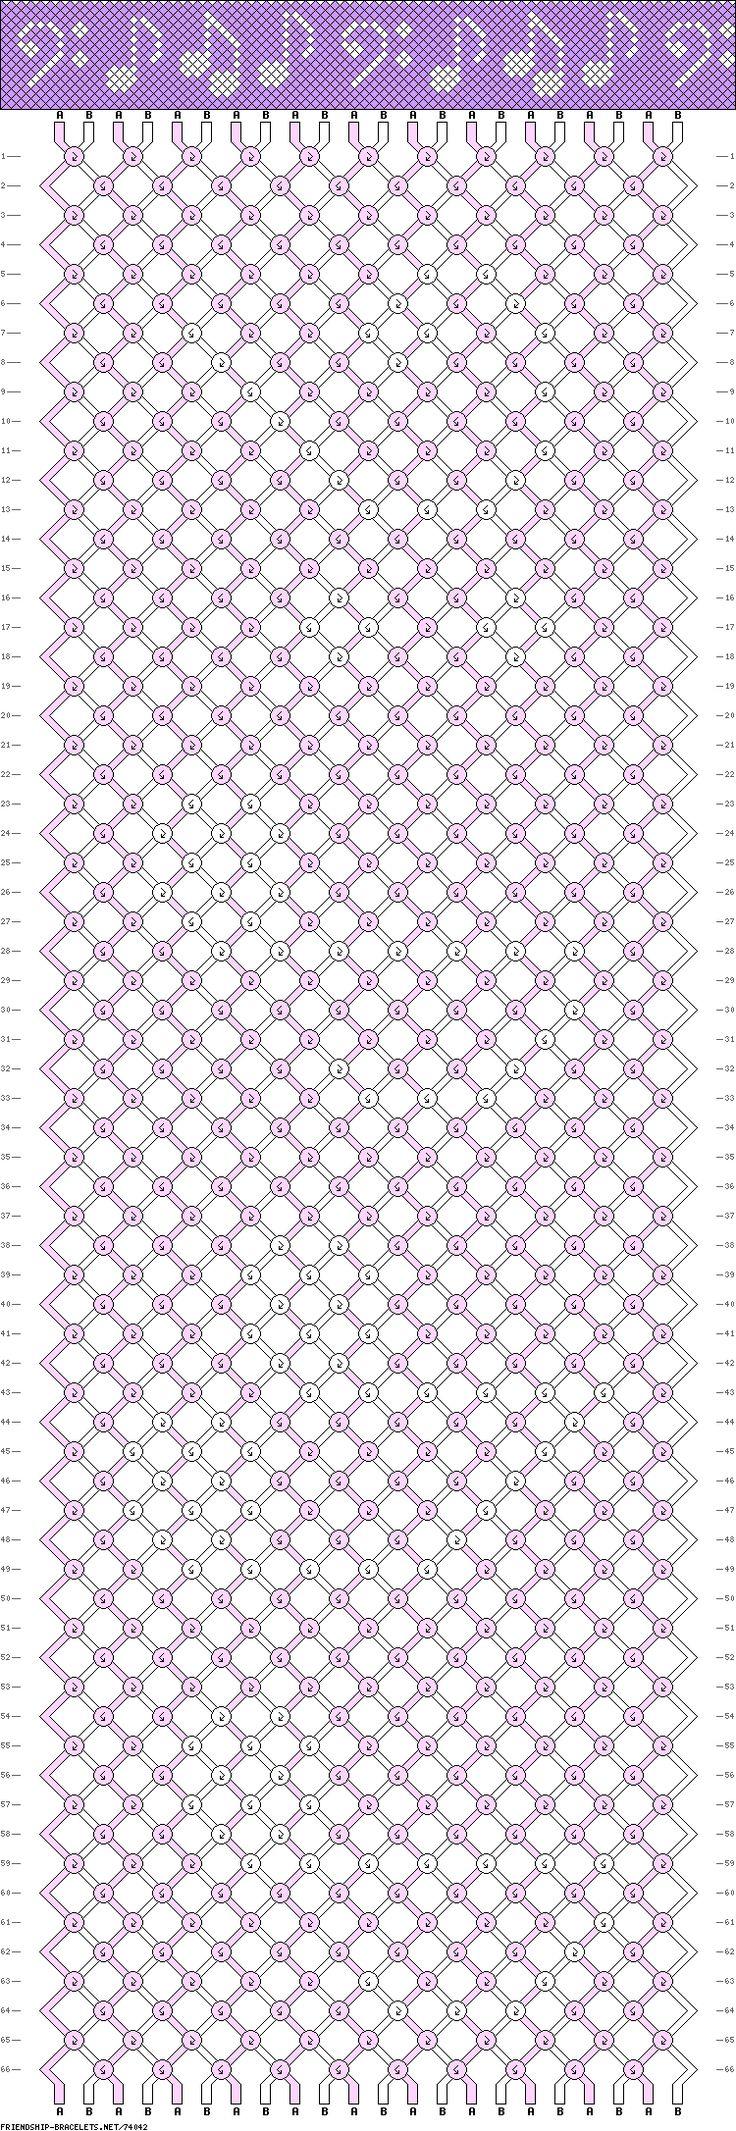 2 colors, 22 strings, 66 rows #friendship #bracelet #pattern #wristband #handmade #craft #DIY #music #sheet